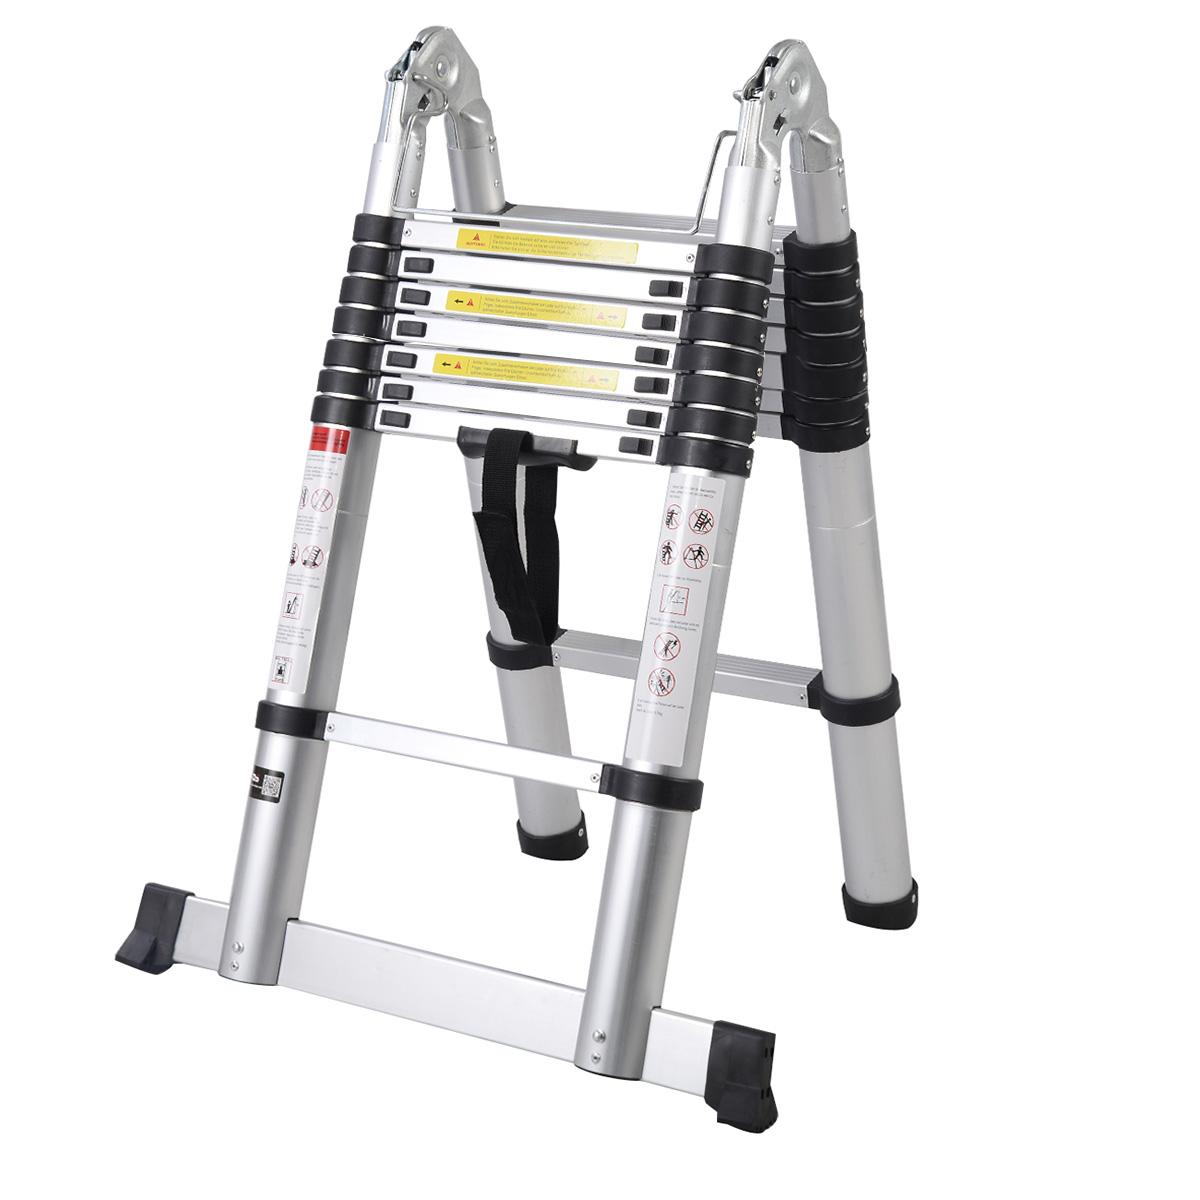 Telescoping Aluminum Extension Ladder : En ft aluminum telescoping telescopic extension